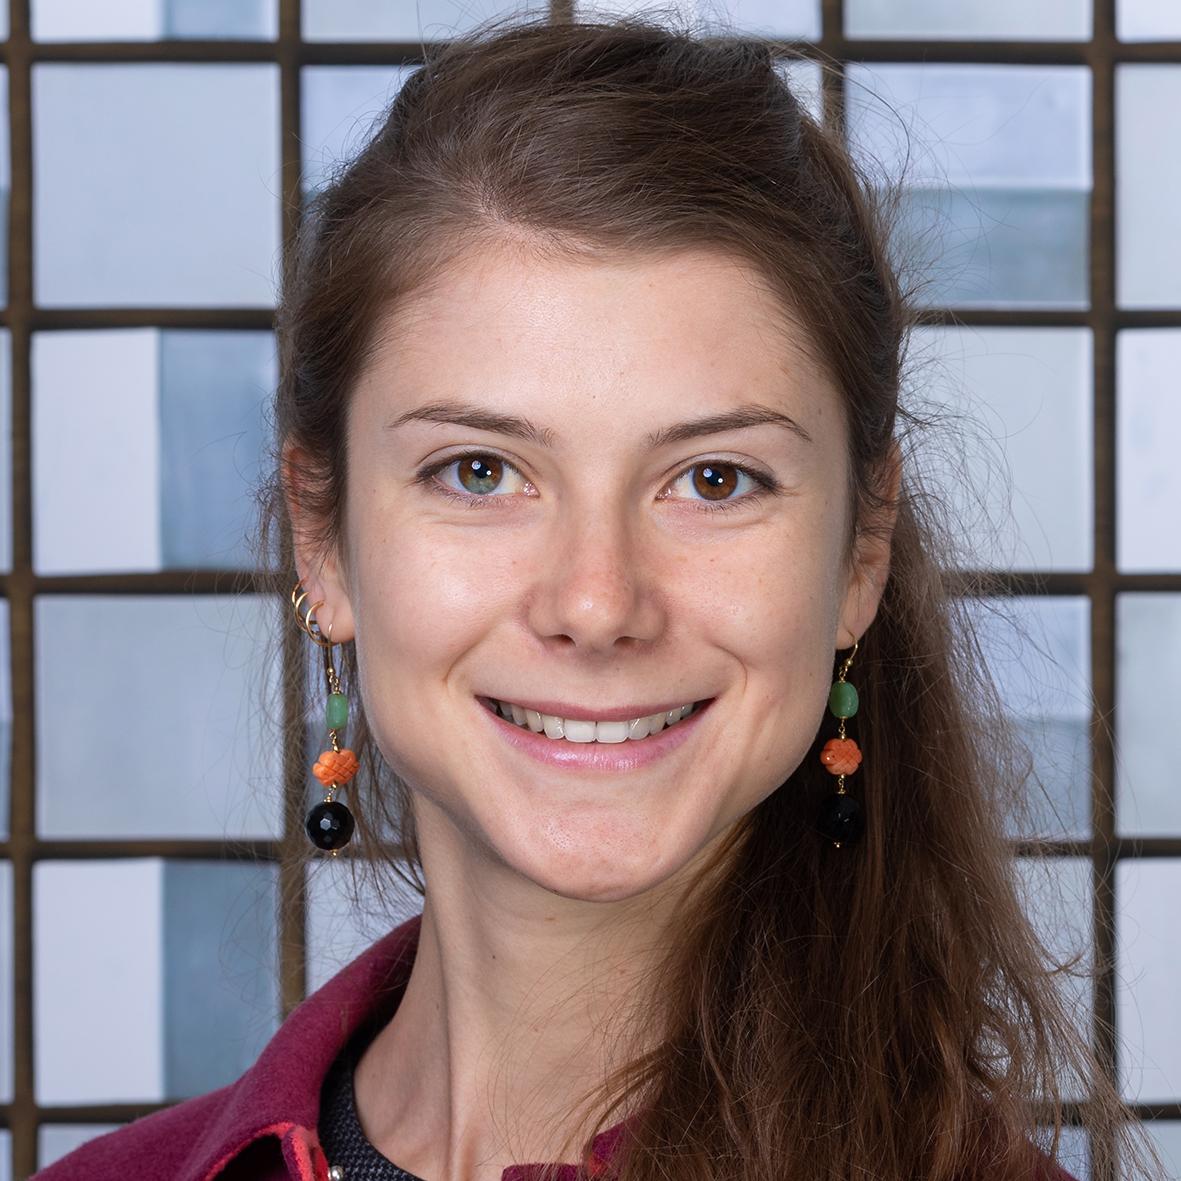 Ludovica Ceschi